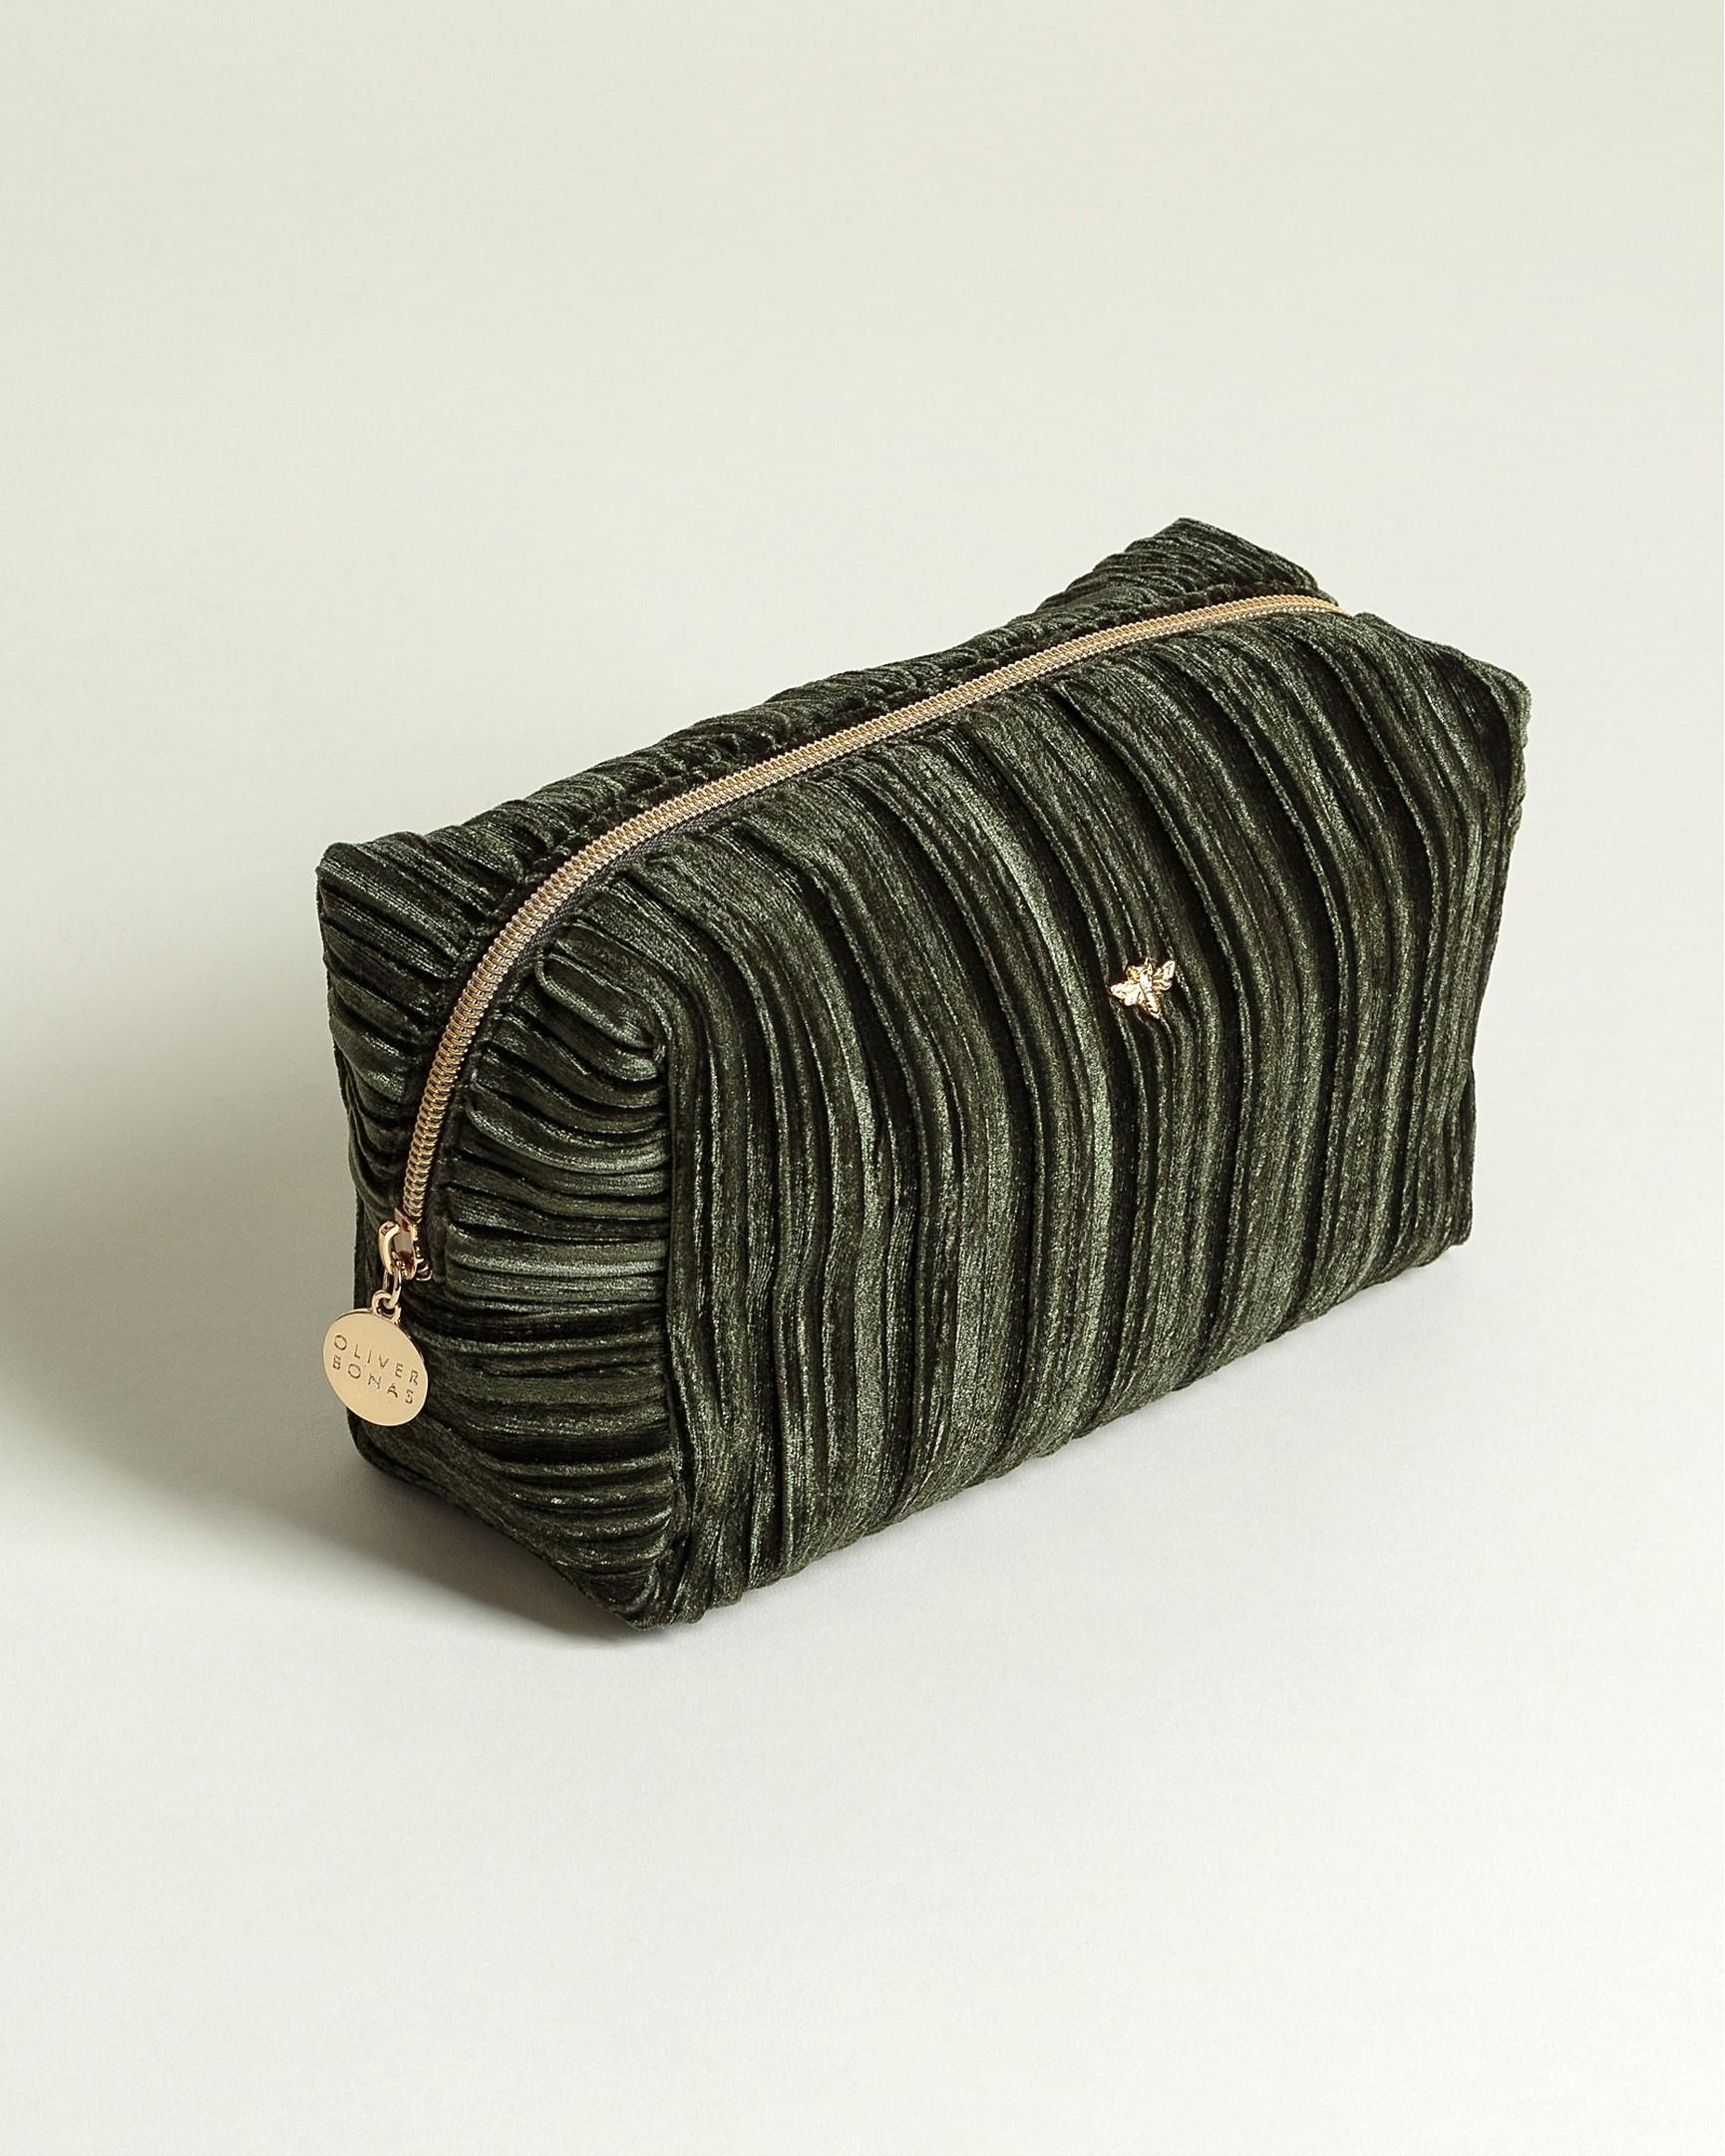 3ec55b5168dc Travel Bags & Accessories | Travel & Holiday Essentials | Oliver Bonas